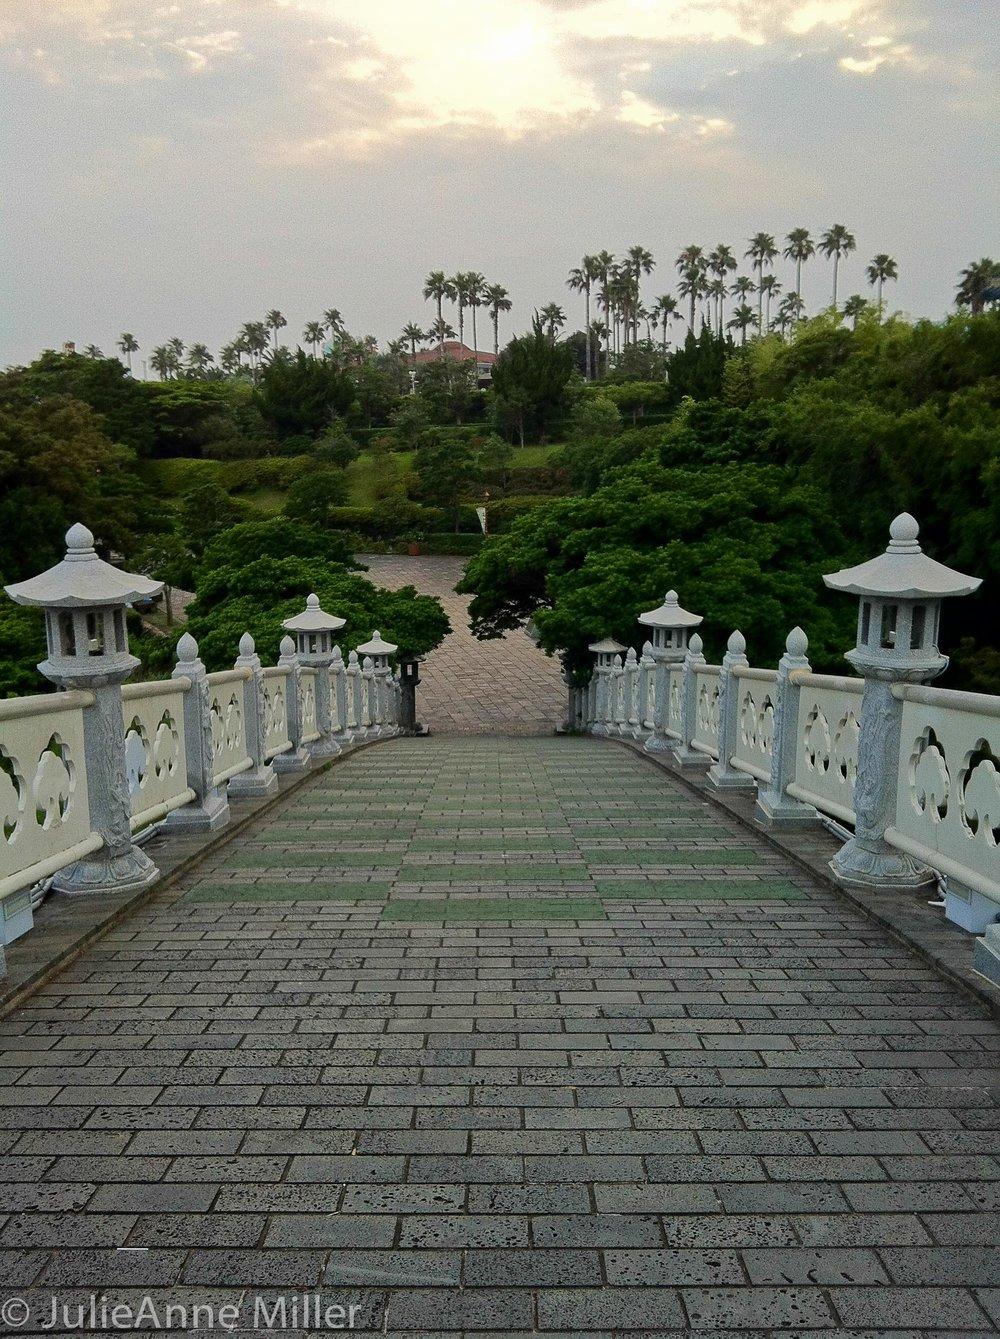 Seonim Bridge, Seogwipo, Jeju Island